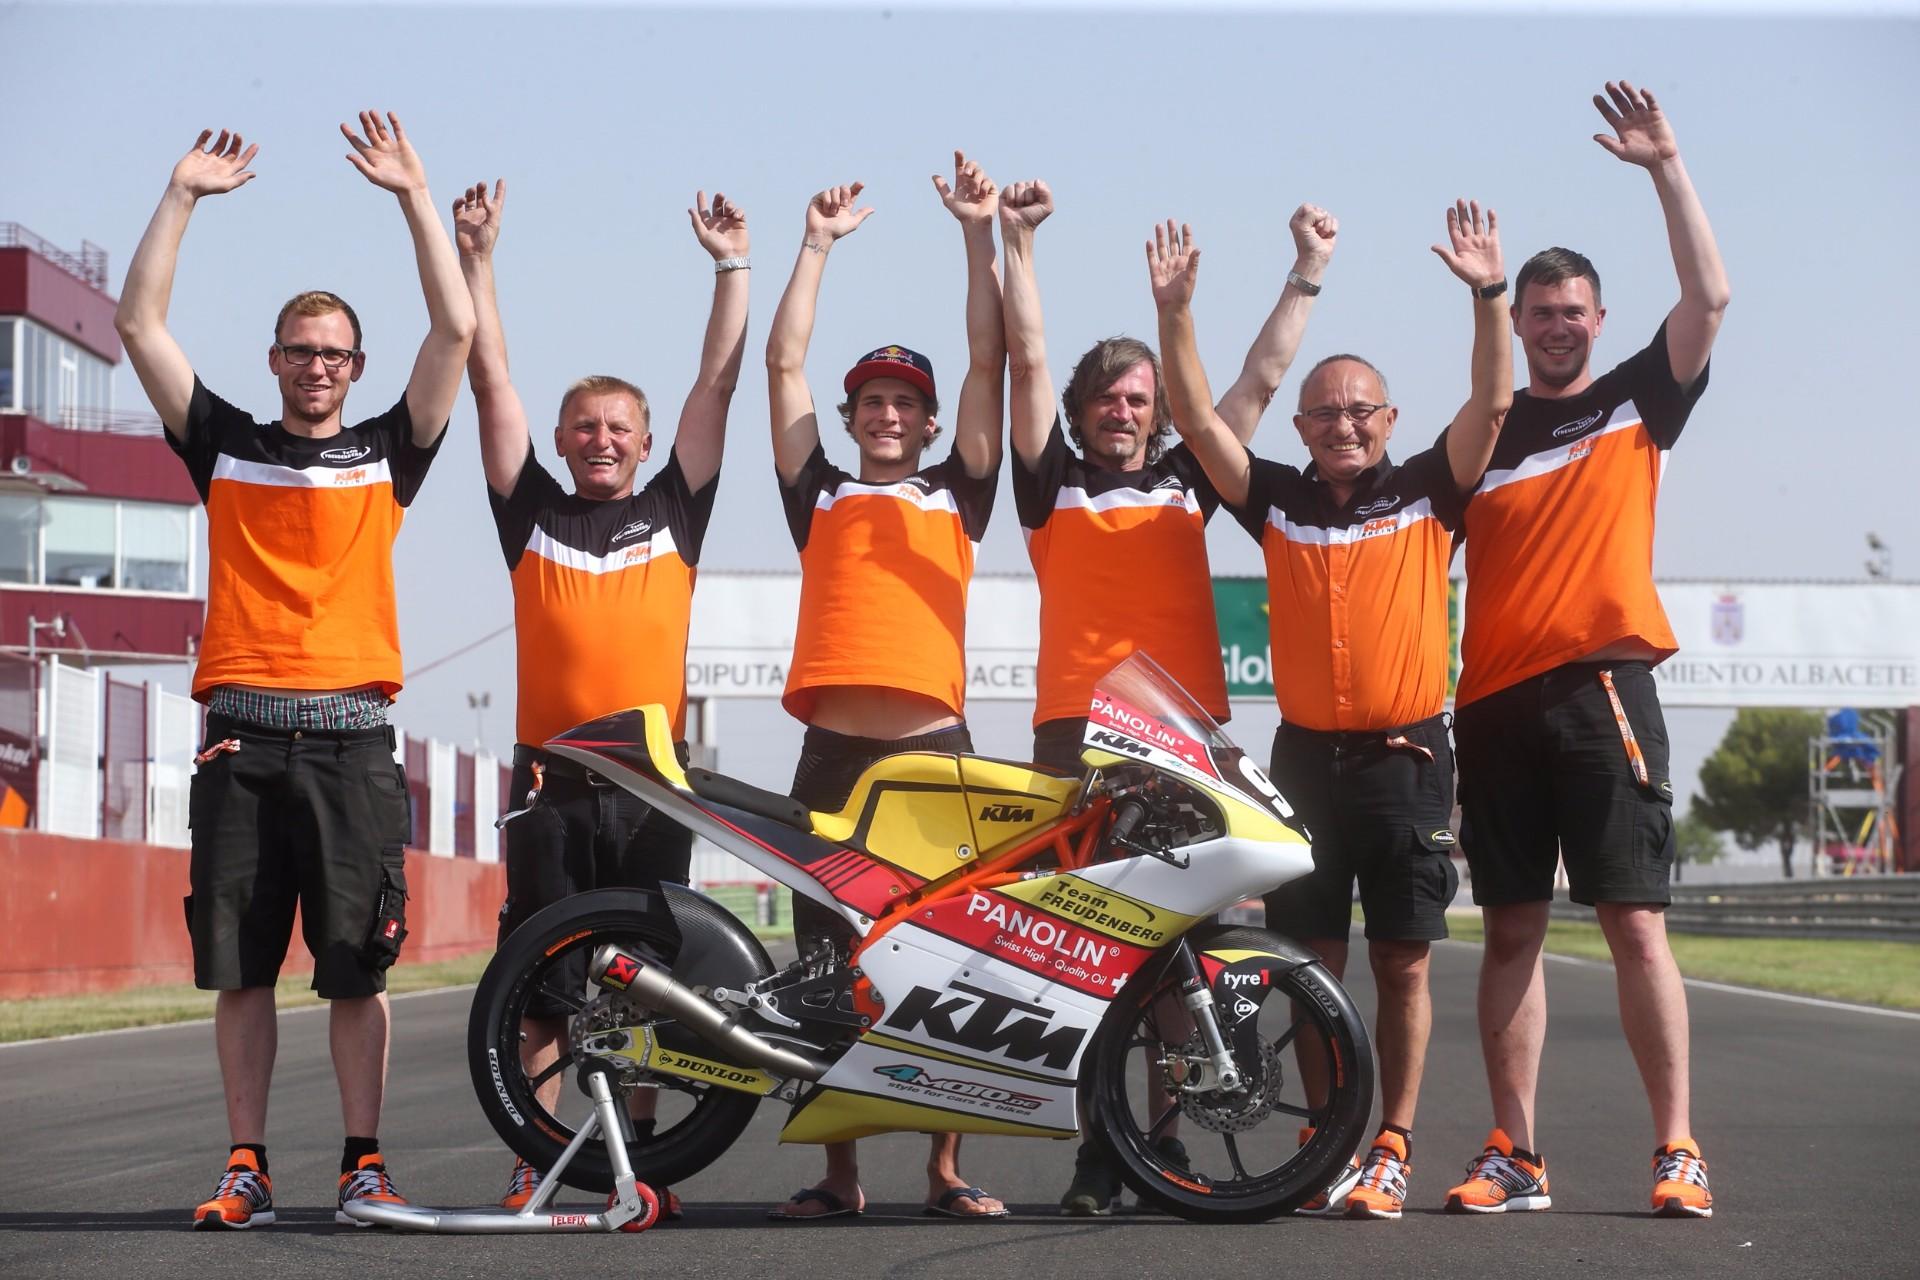 Wildcard beim Finale der MotoGP™